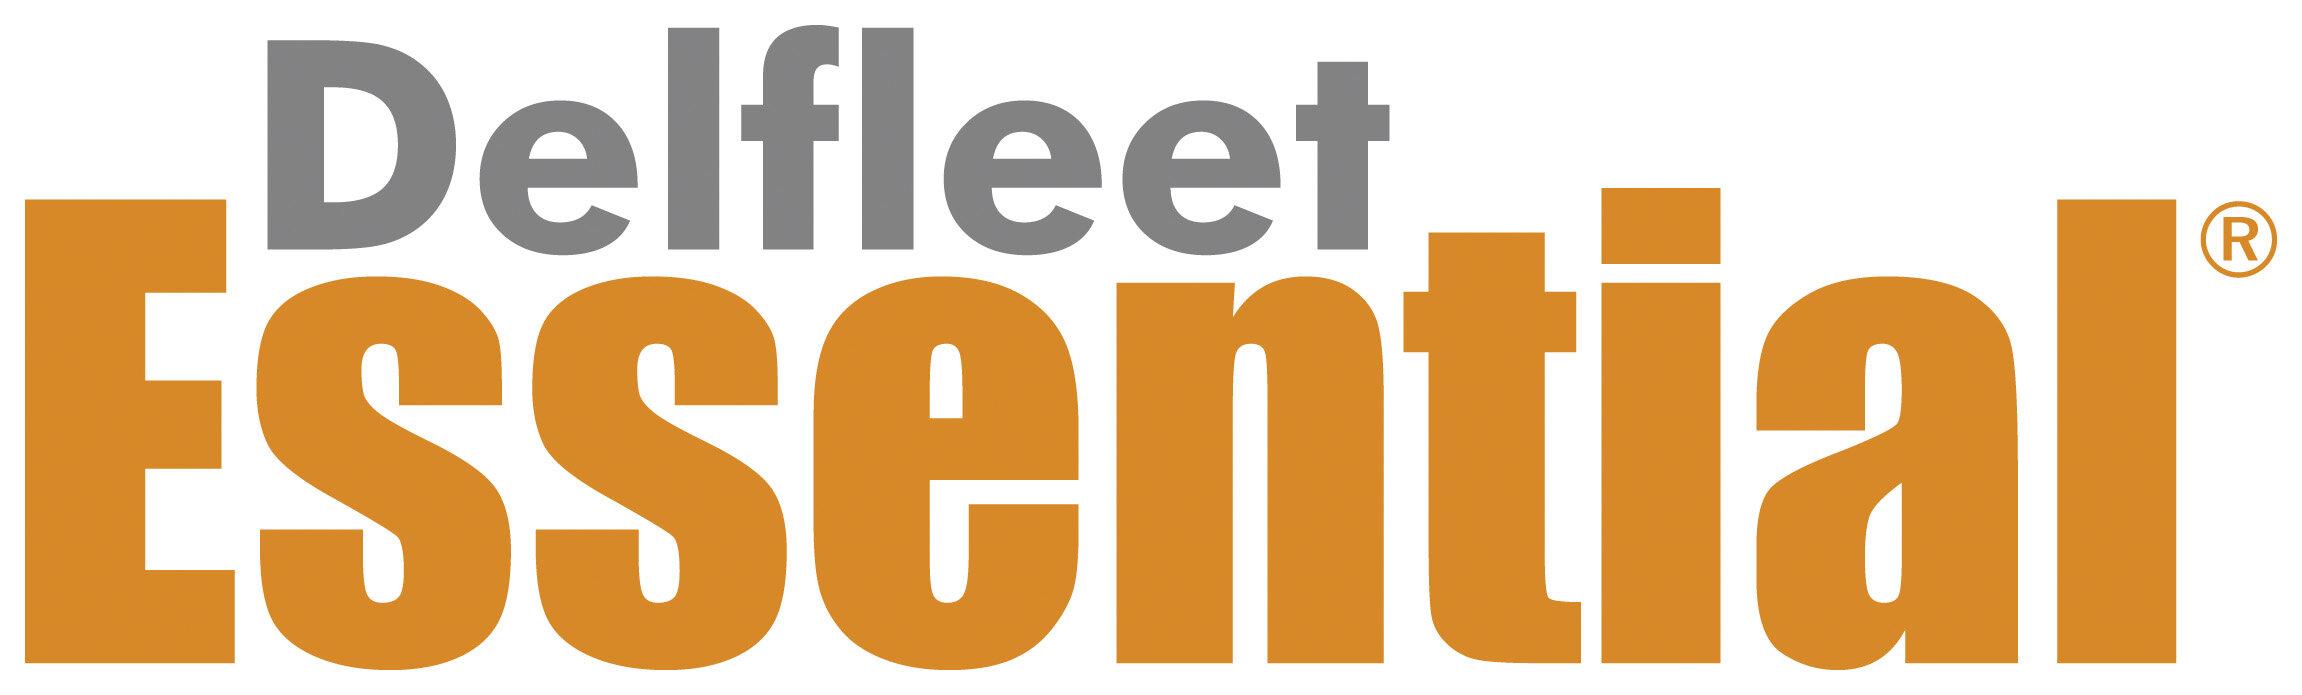 Delfleet_Essential_logo_clr.jpg